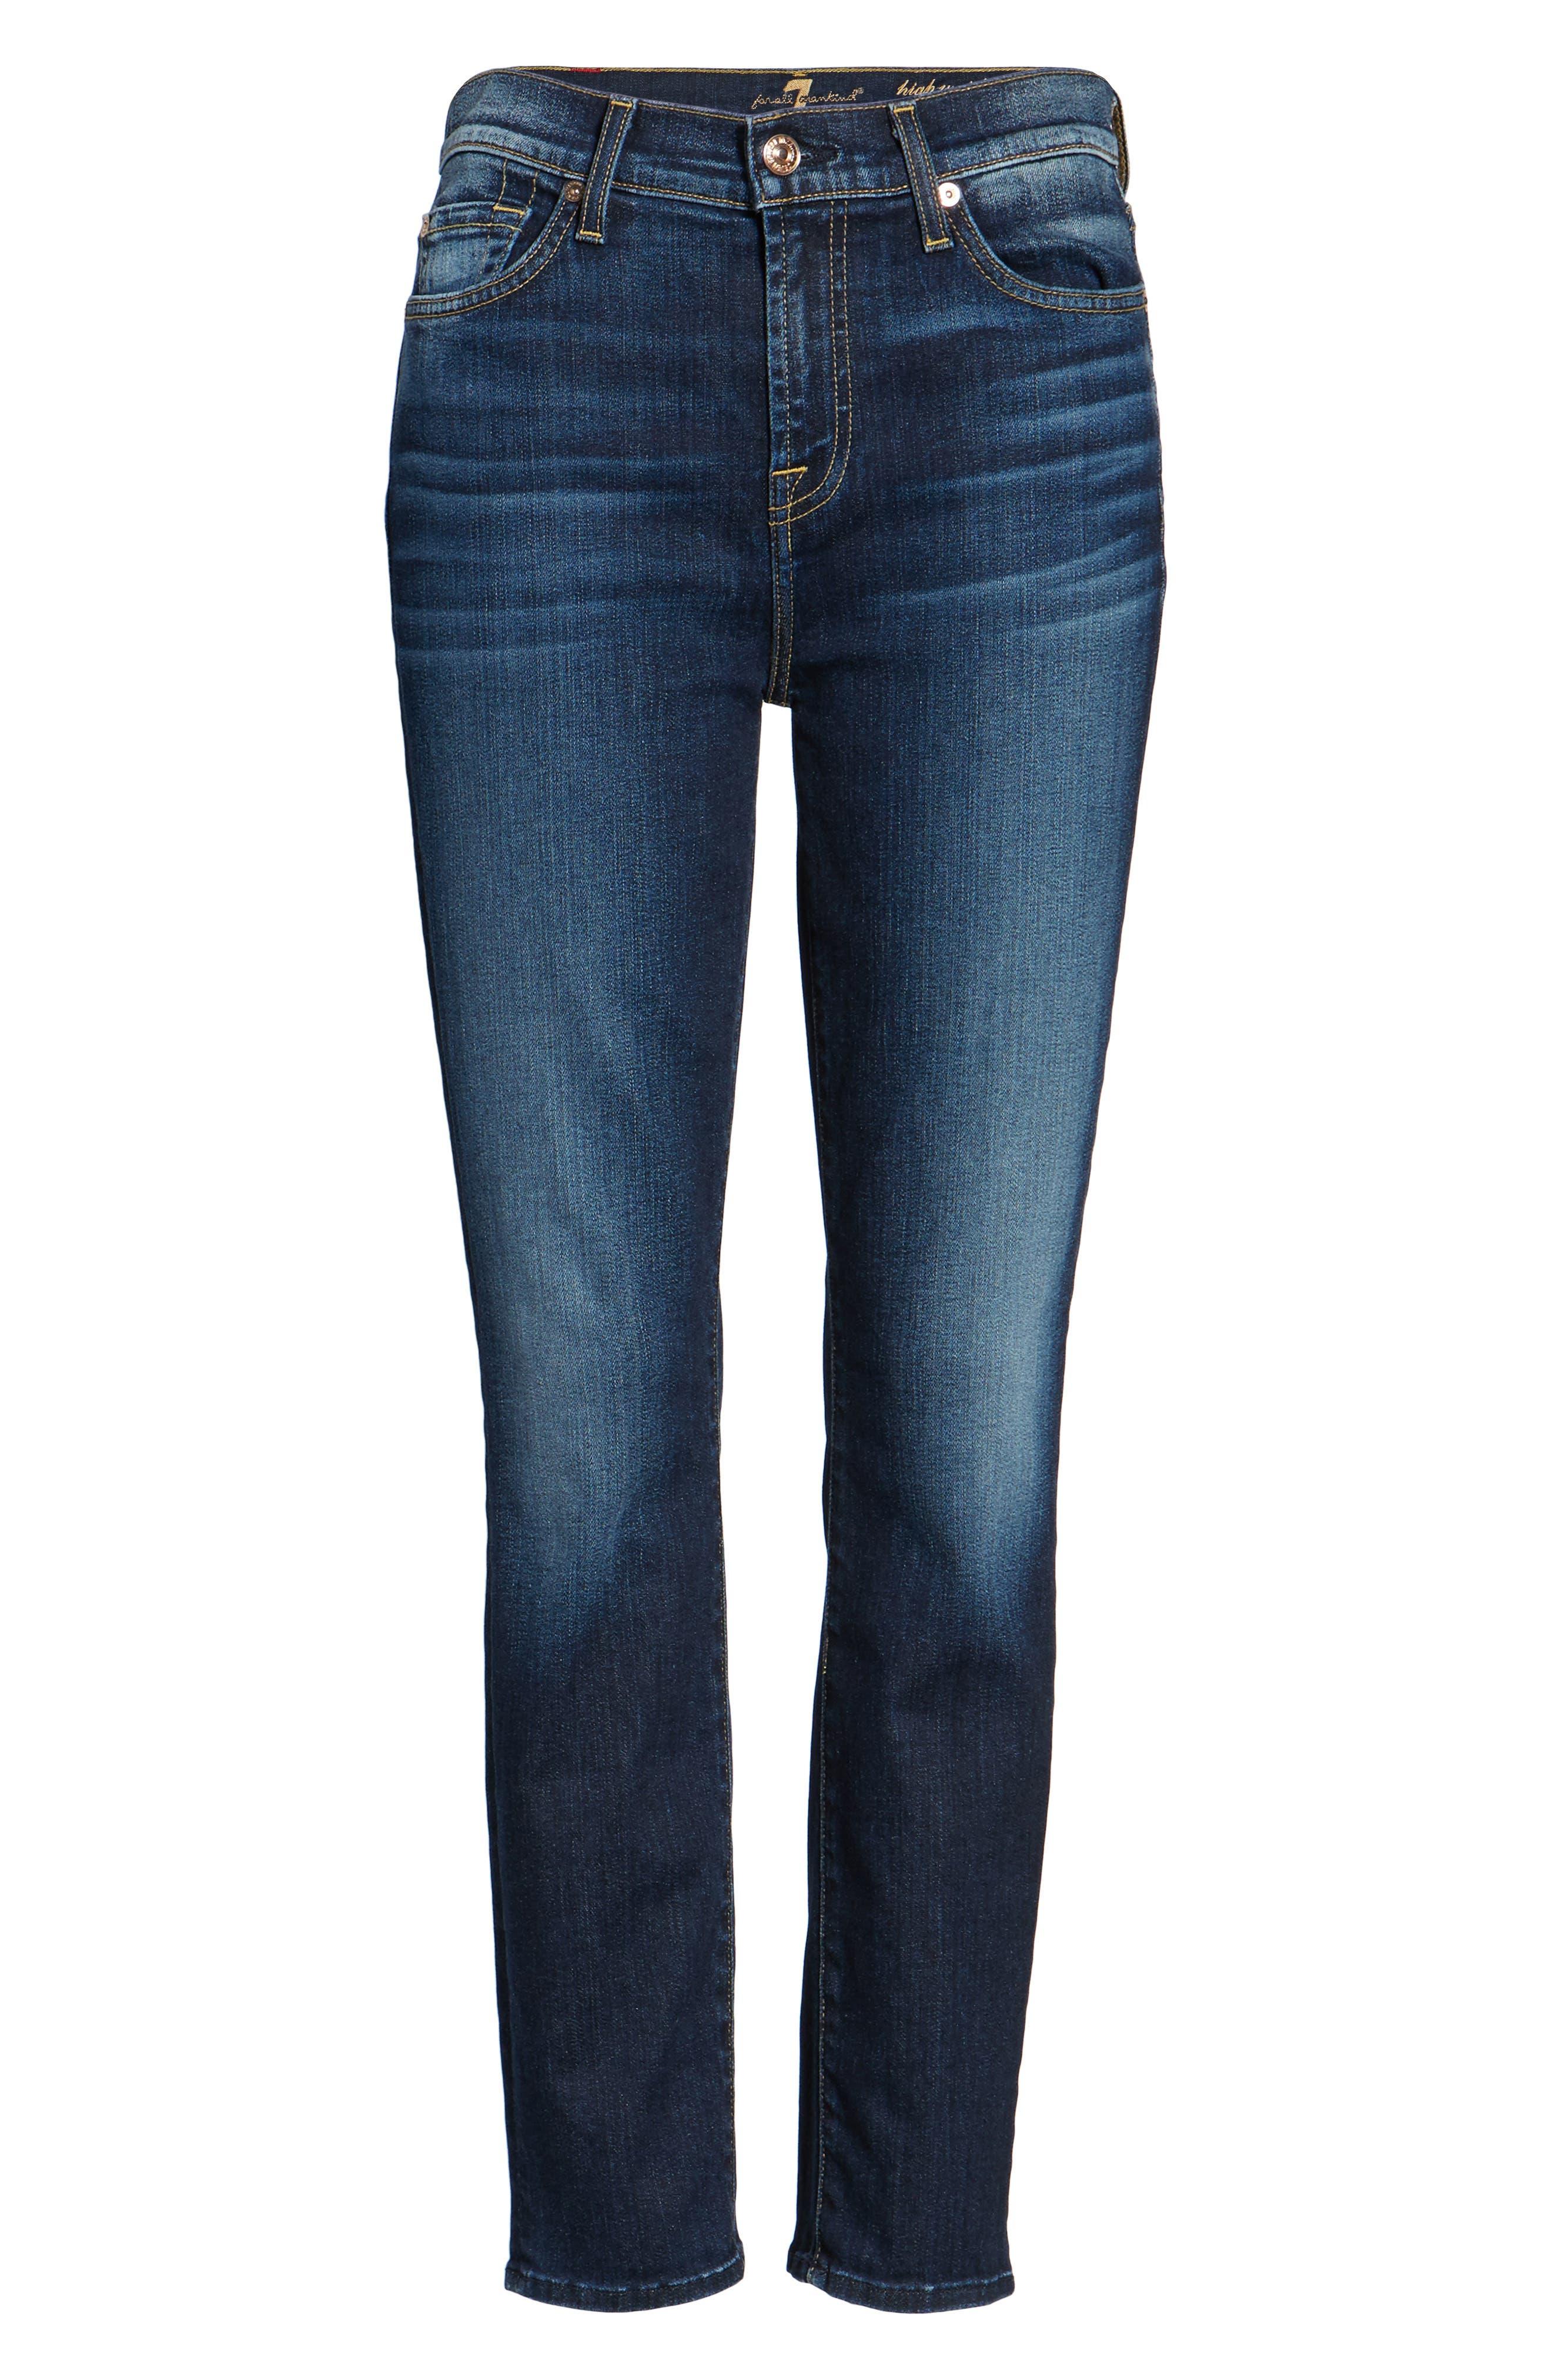 Seven7 Roxanne High Waist Ankle Jeans,                             Alternate thumbnail 6, color,                             Aggressive Madison Ave